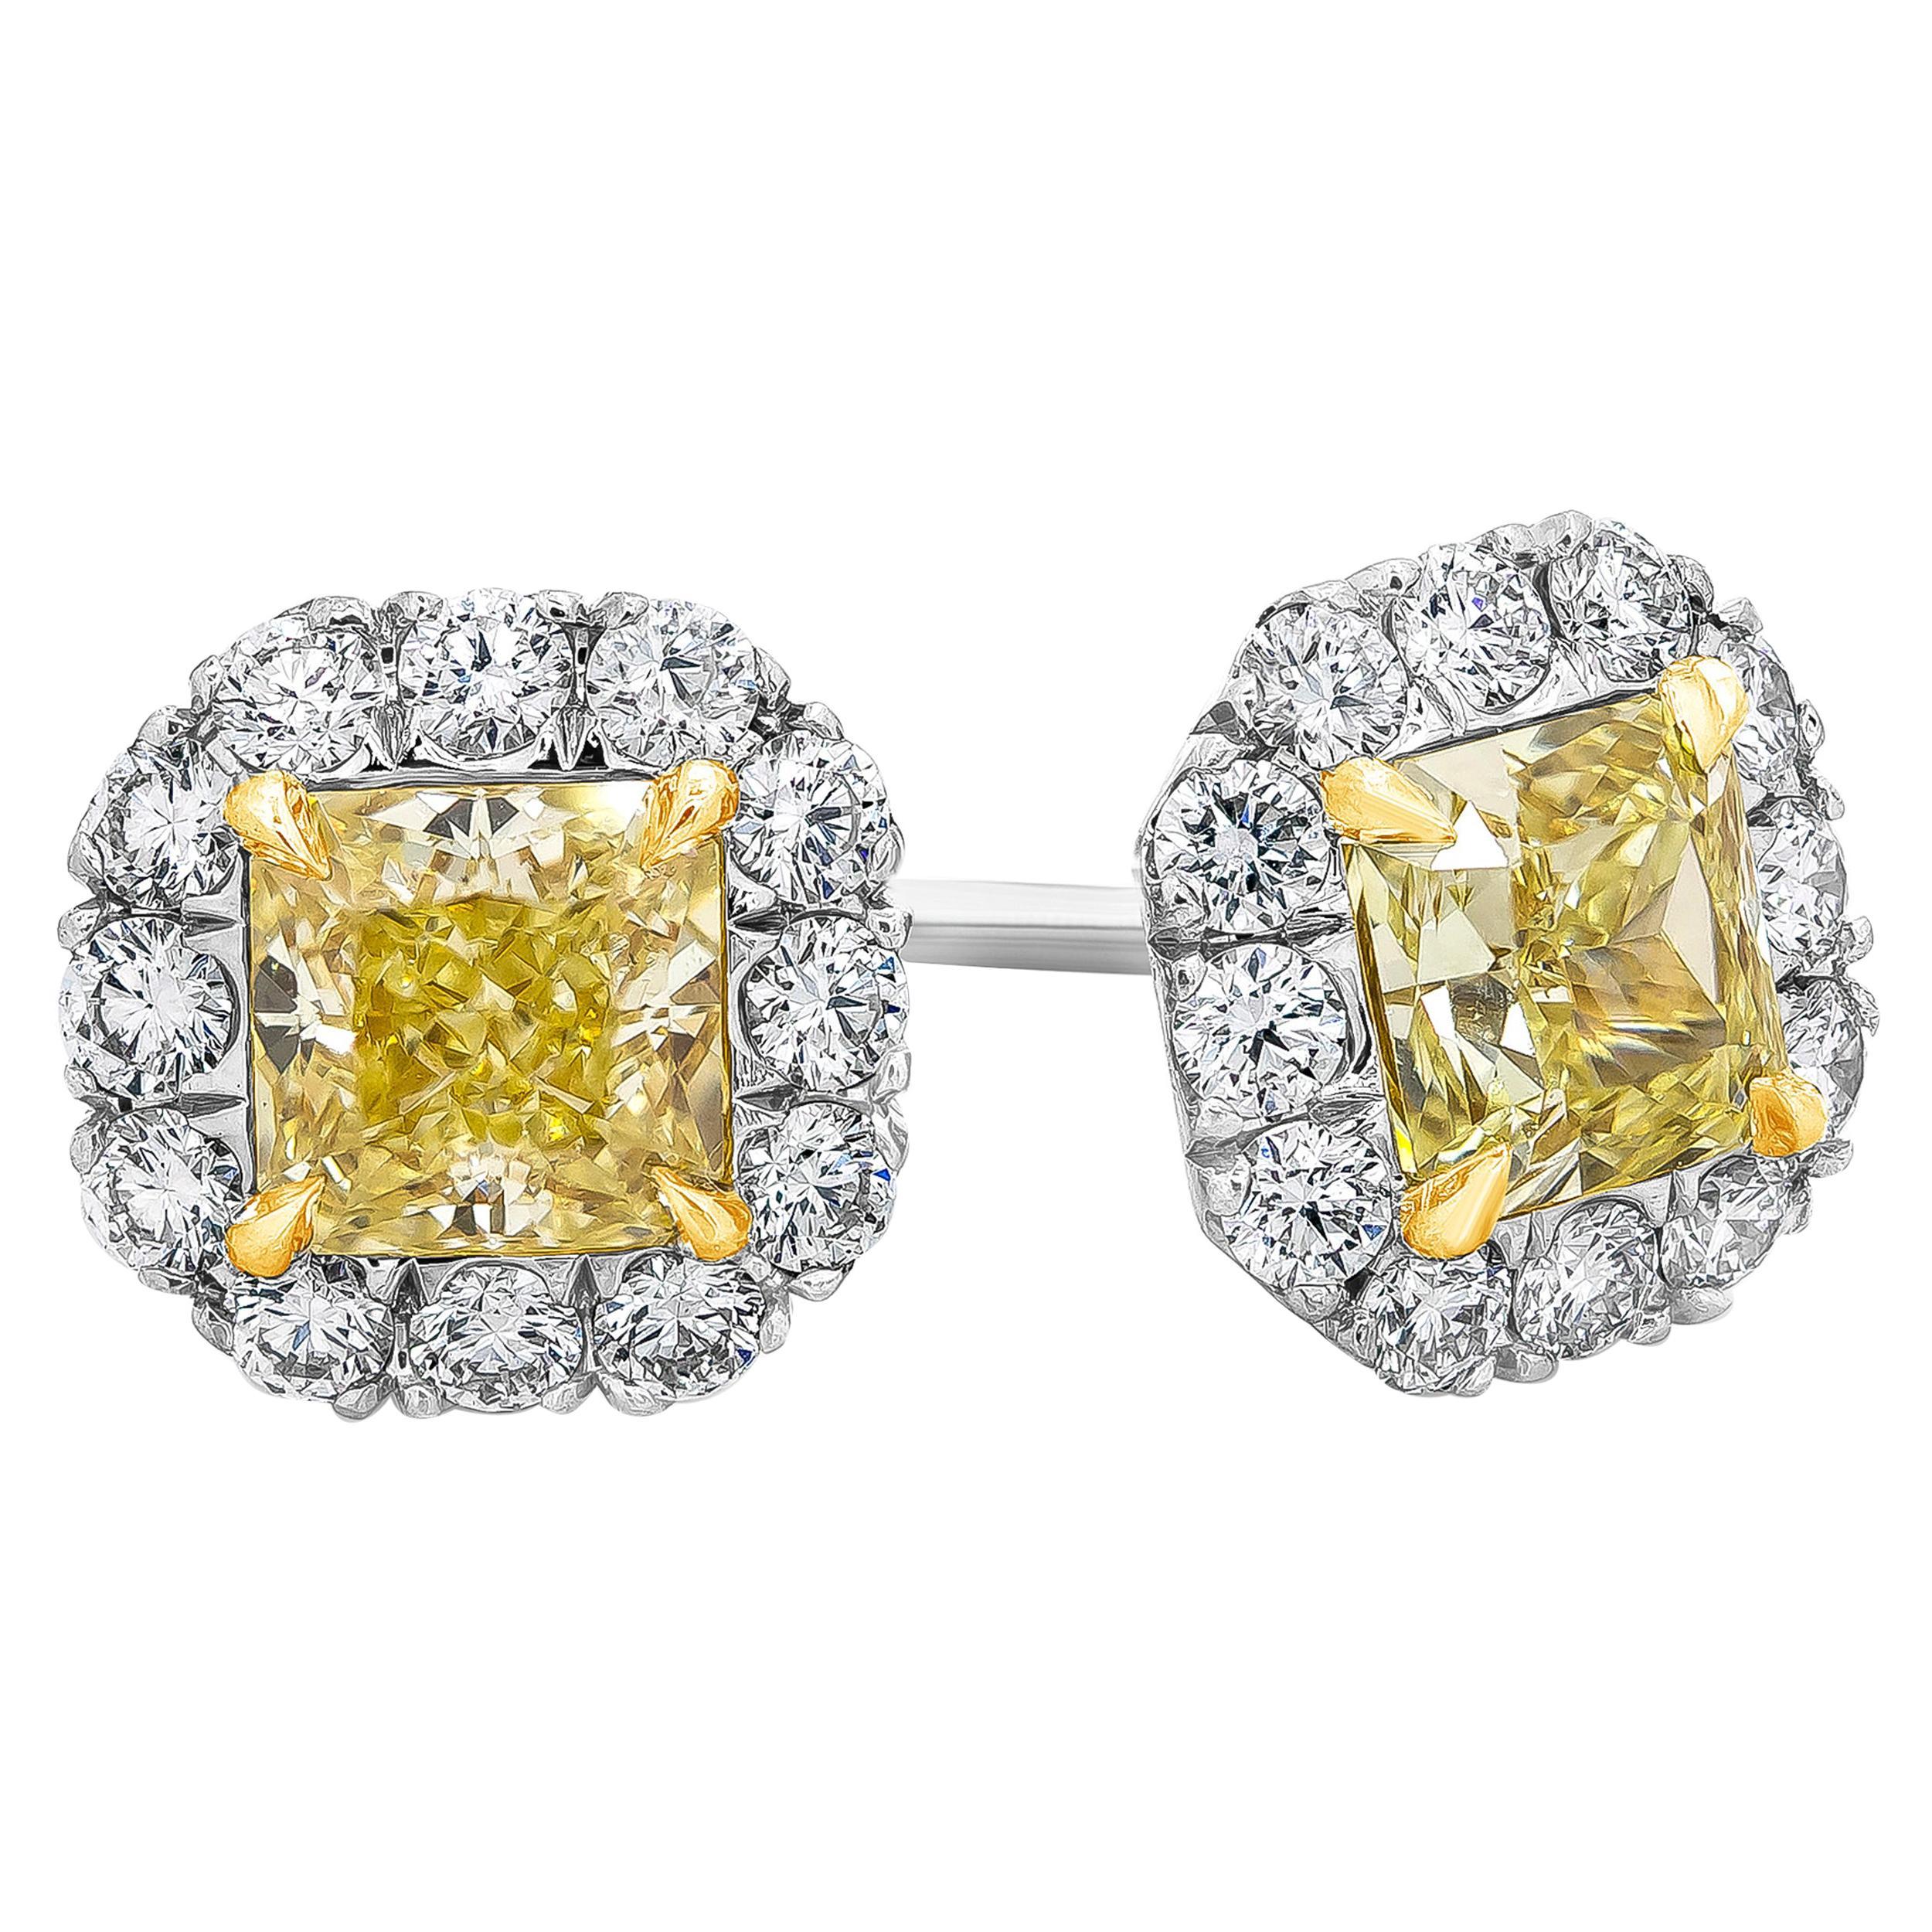 Roman Malakov, GIA Certified Yellow Diamond Halo Stud Earrings